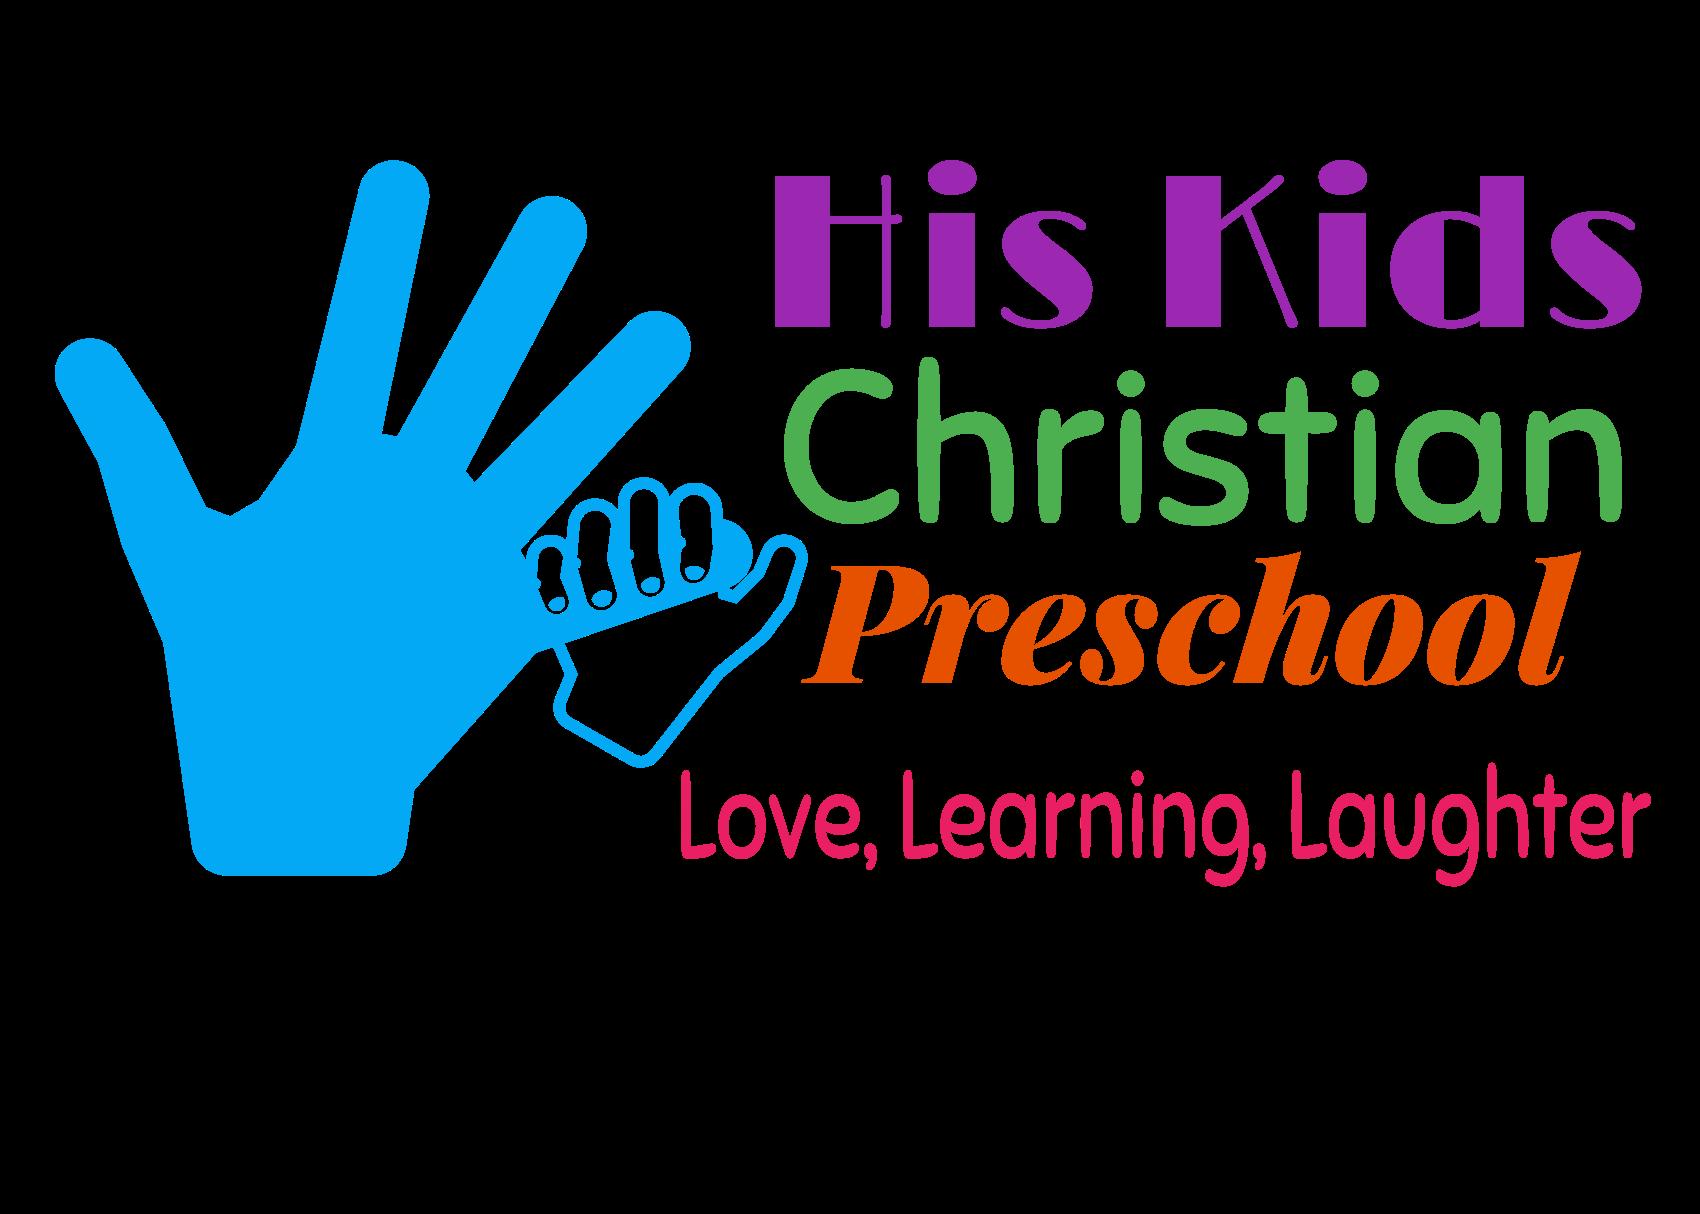 His Kids Christian Preschool